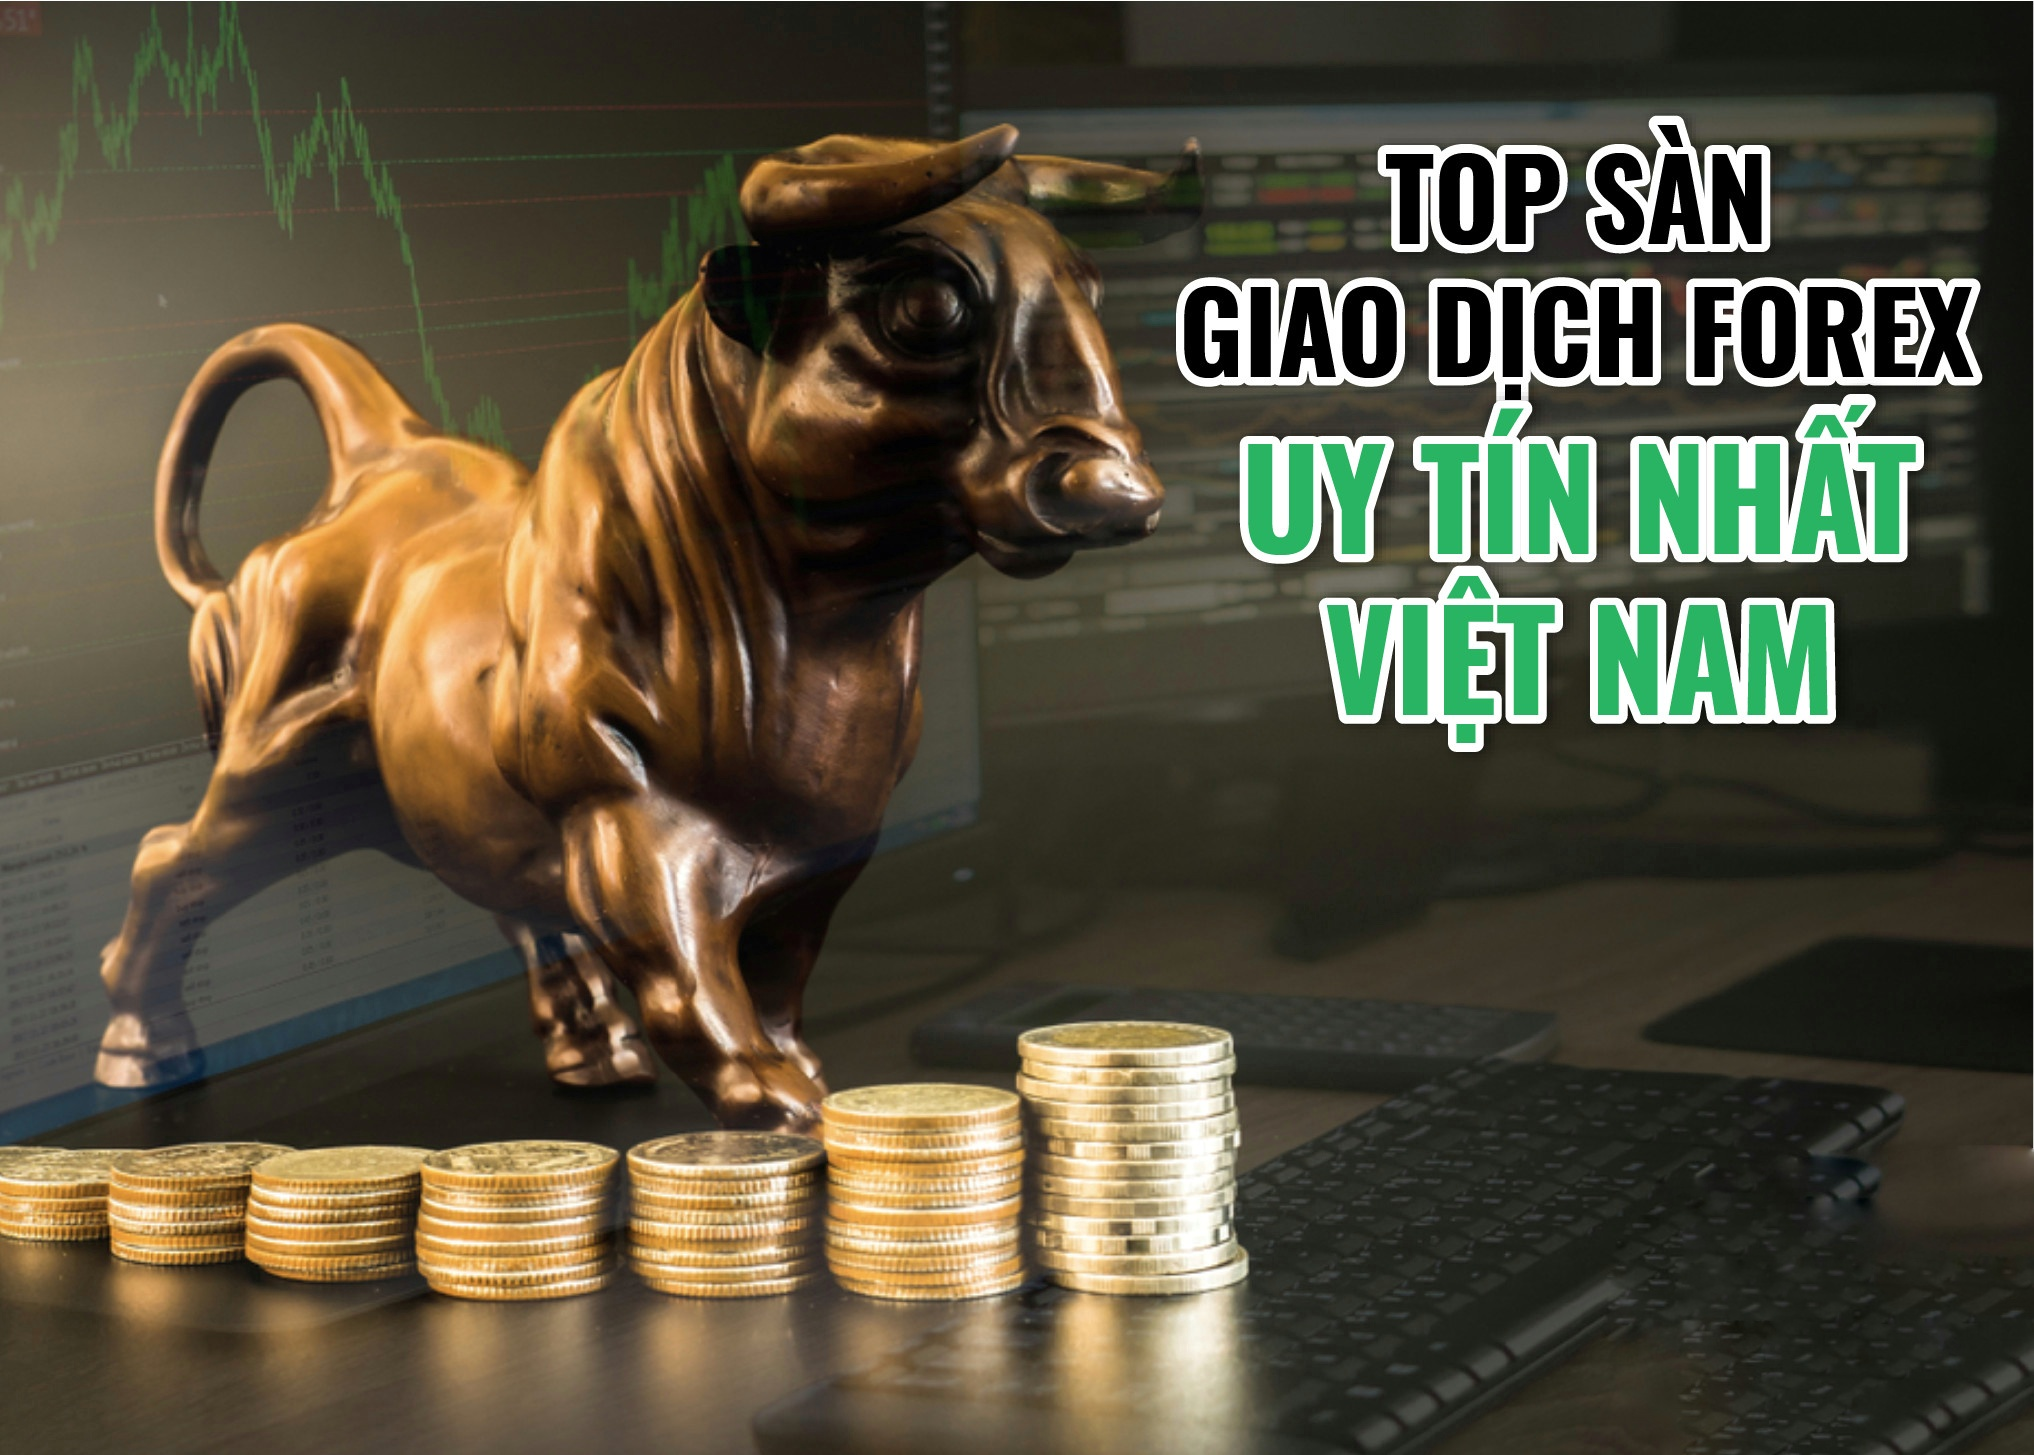 top-5-san-giao-dich-uy-tin-nhat-the-gioi-1